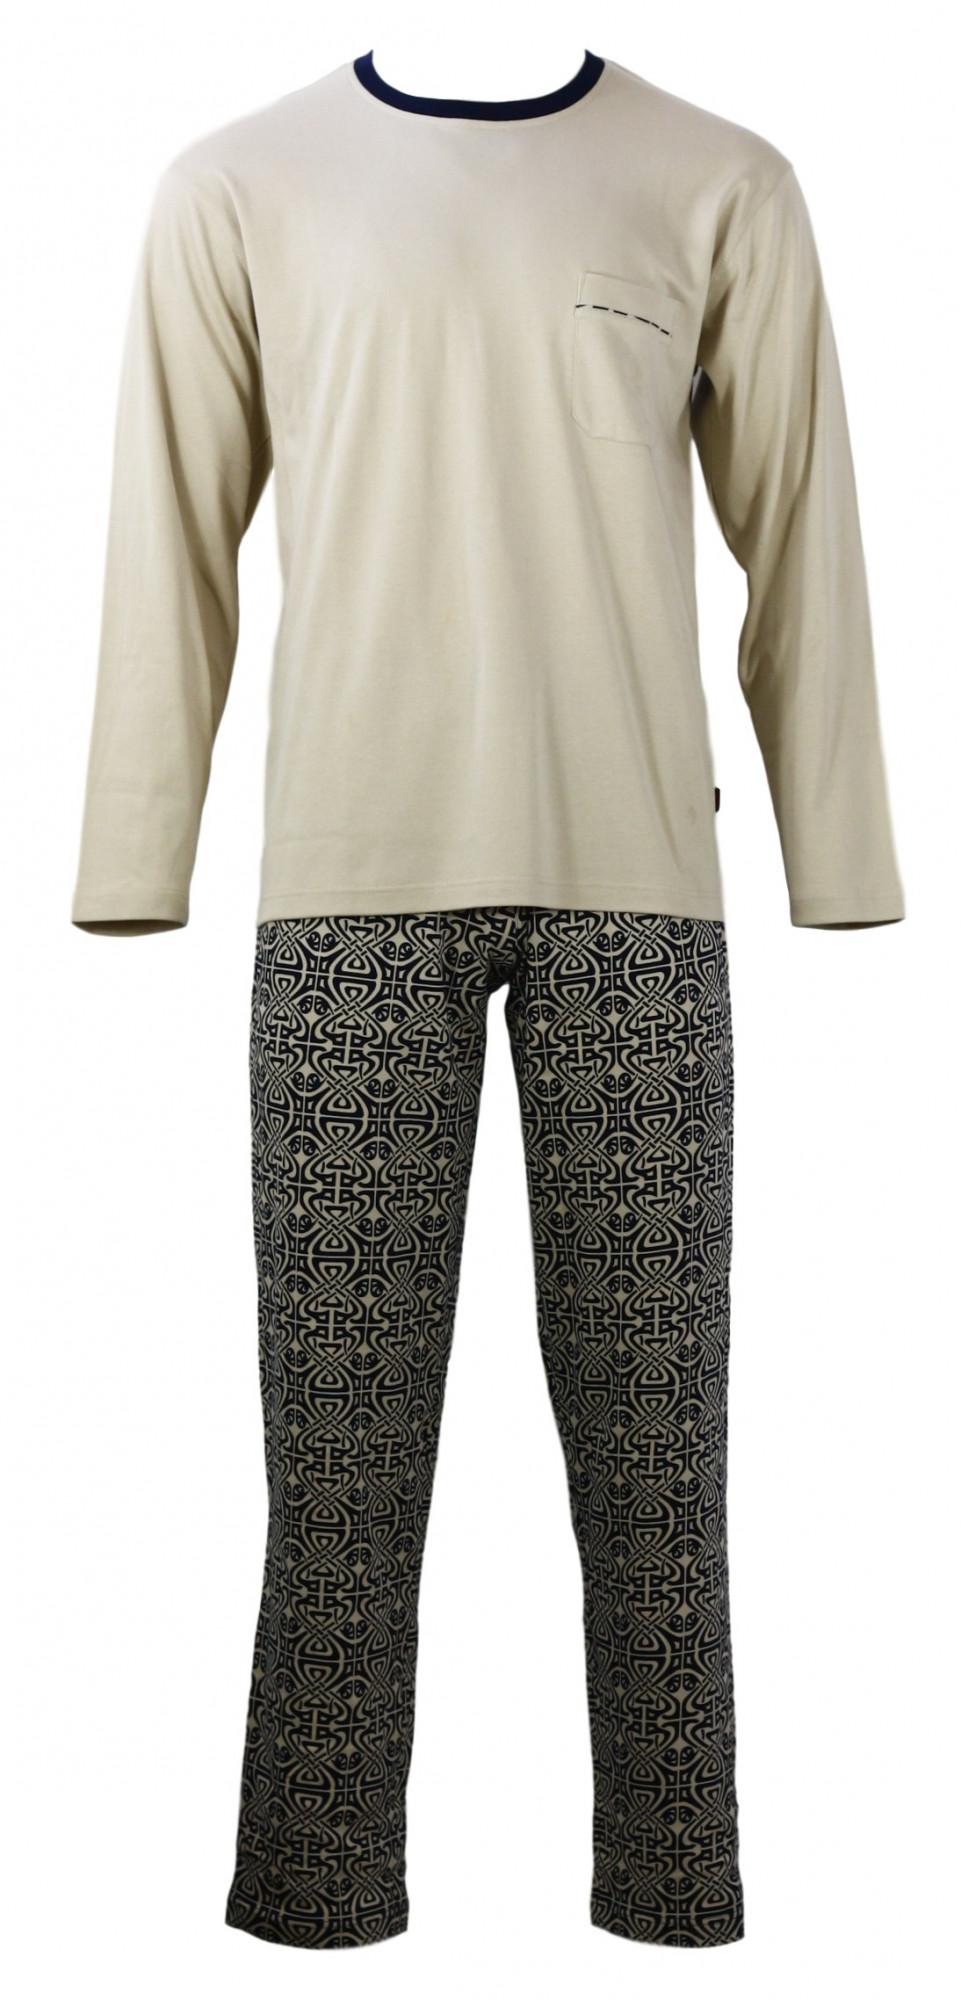 Pánské pyžamo s dlouhým rukávem TASIM - Favab Barva: béžová, Velikost: M